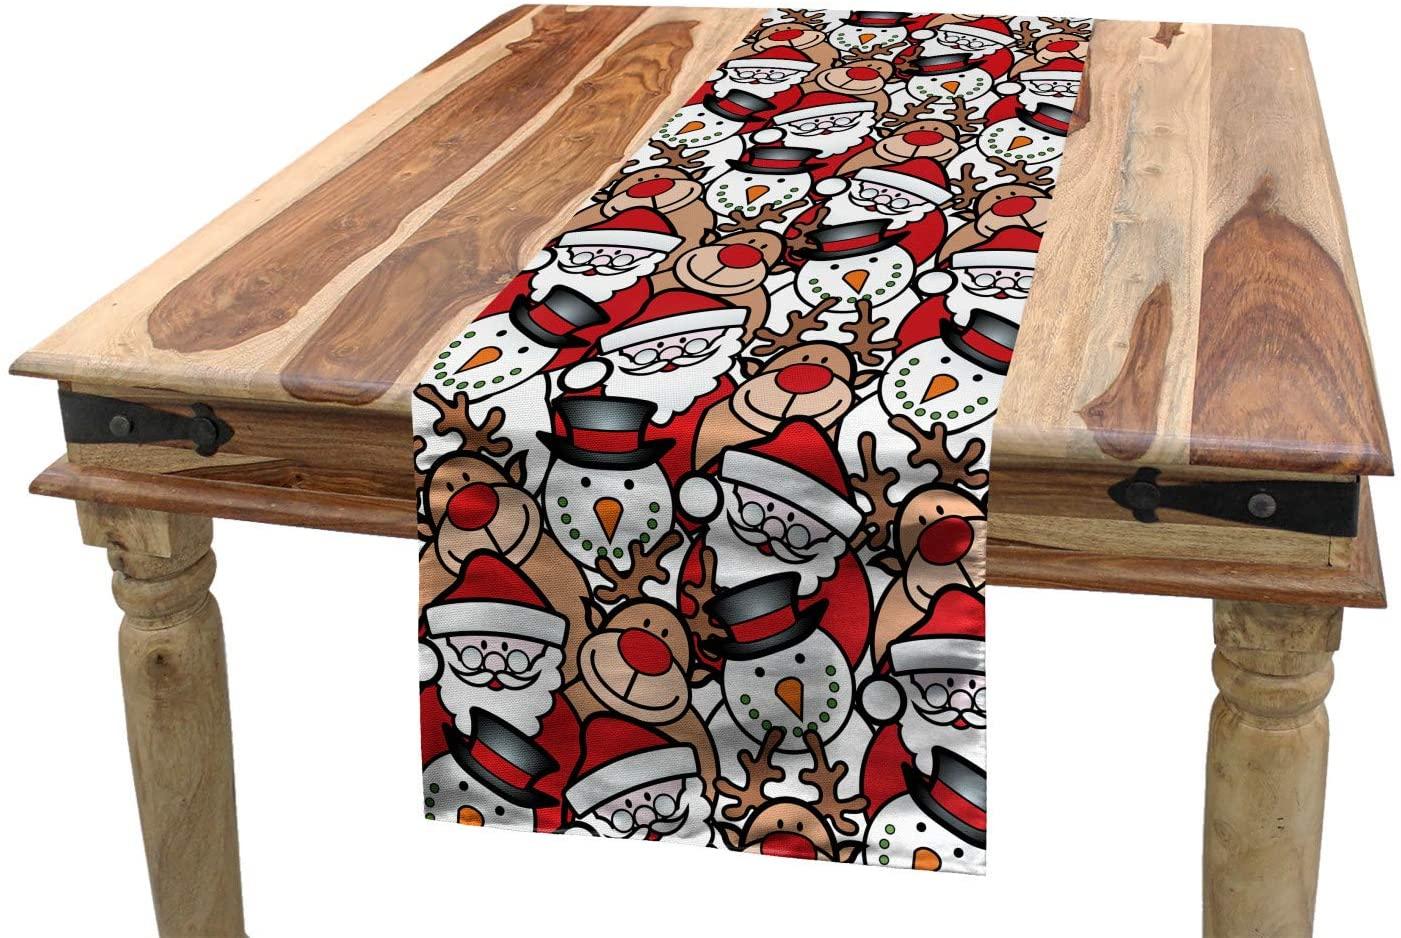 Ambesonne Christmas Table Runner, Snowman Reindeer Santa Claus Cartoon Image Theme Winter, Dining Room Kitchen Rectangular Runner, 16